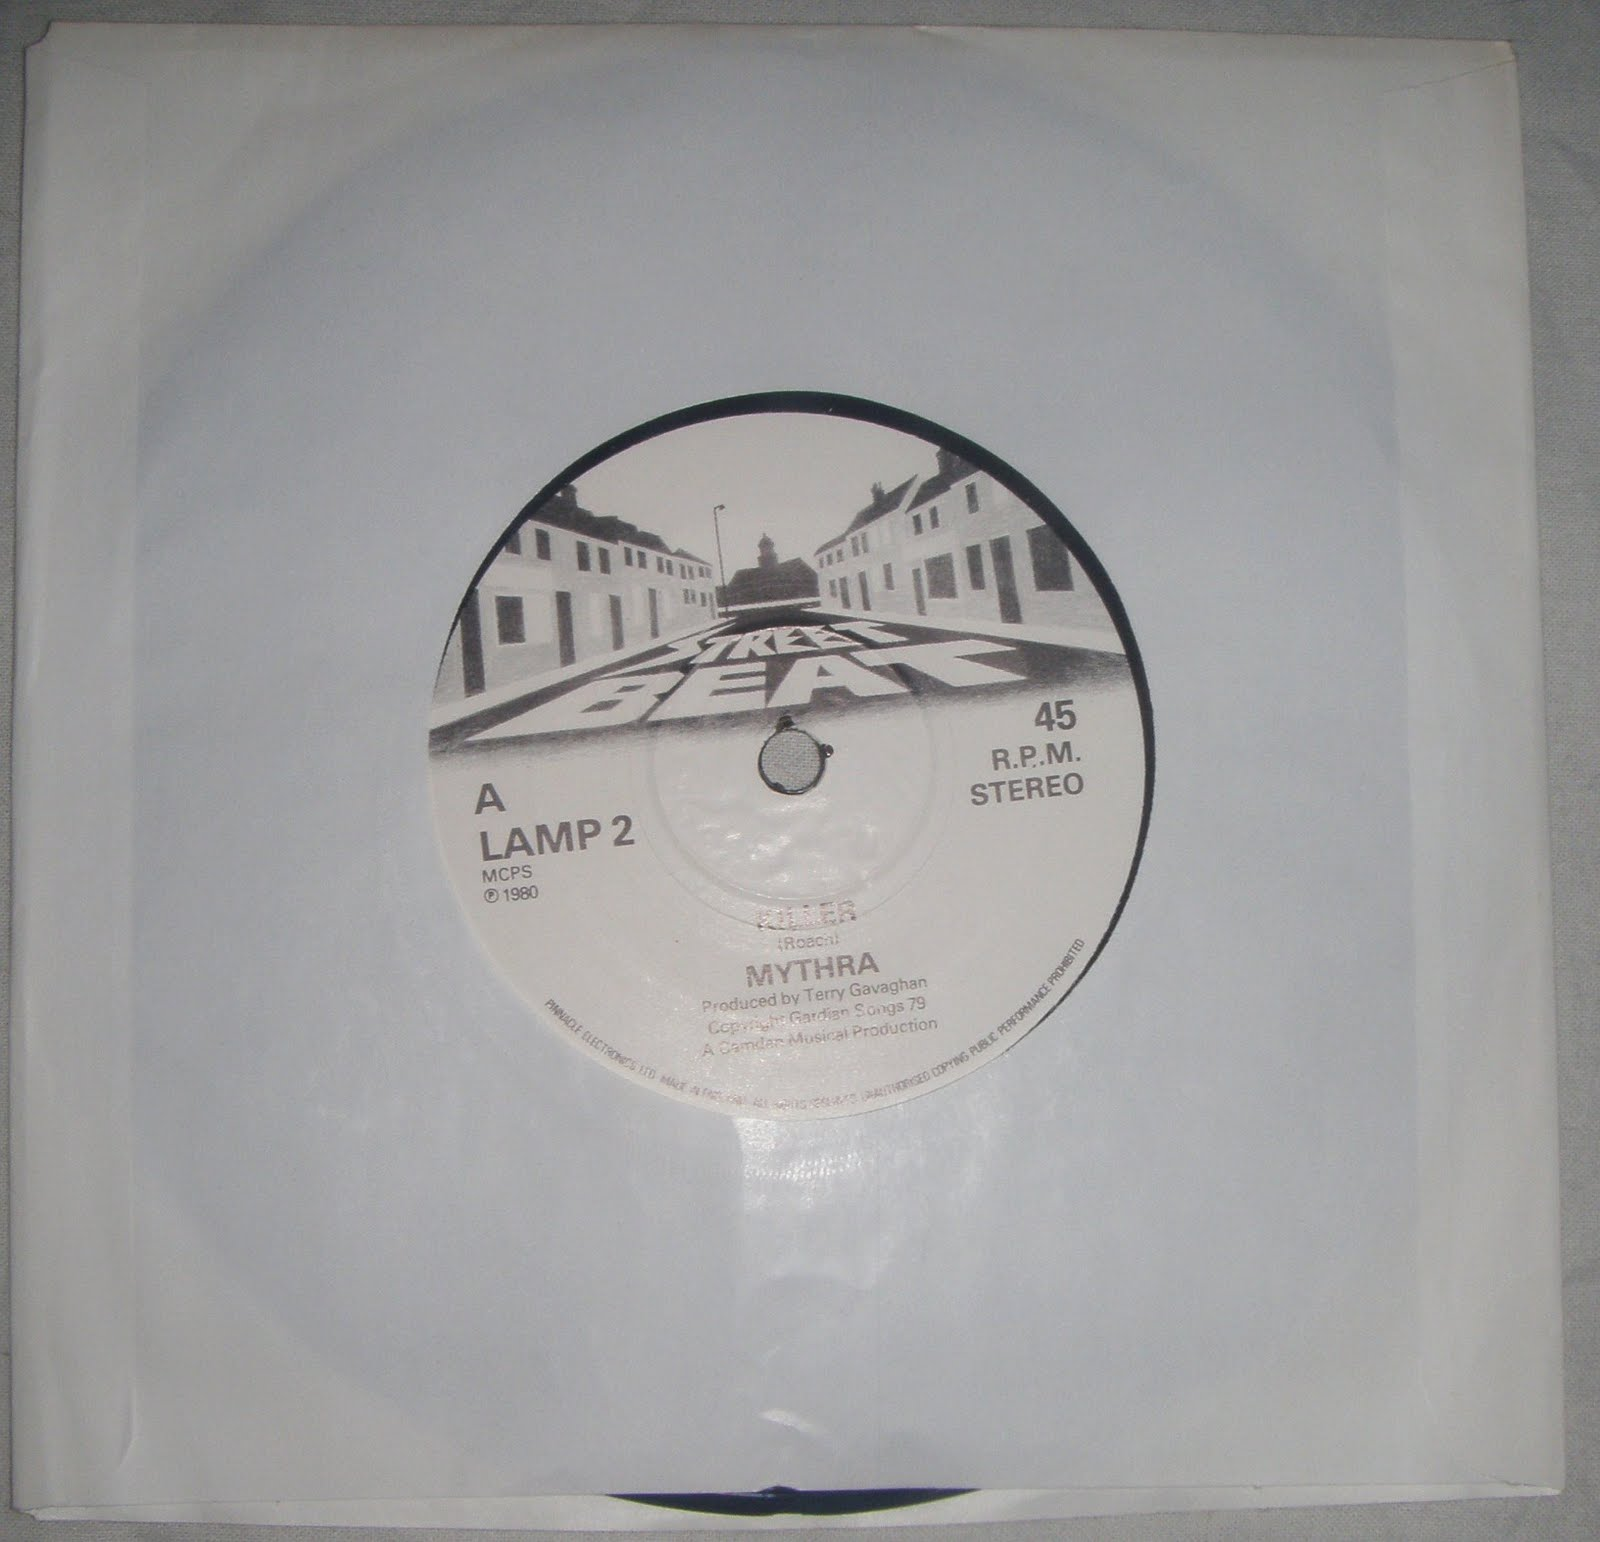 Mythra (South Shields, Tyne and Wear) Vinyl%2BA-Side